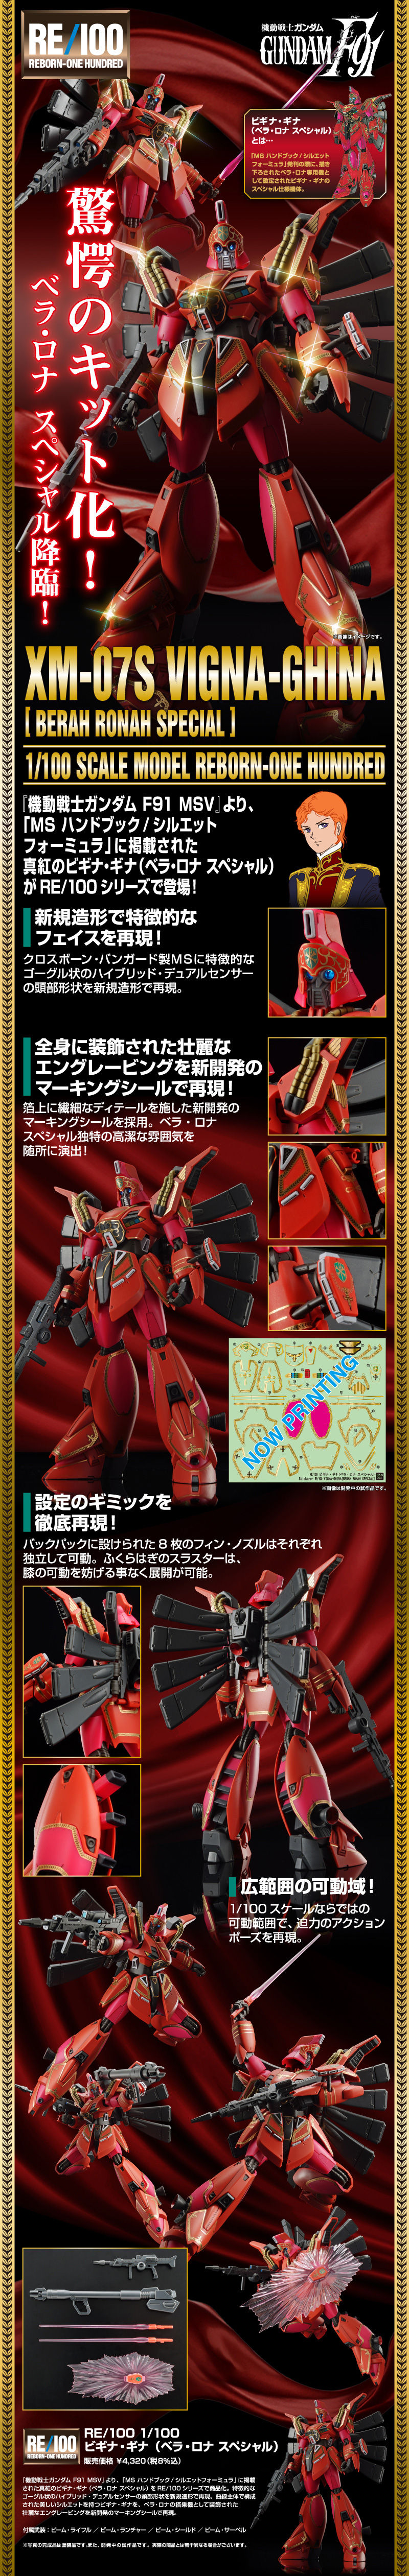 Gundam - Page 89 20180724_vignaghina_sp_02